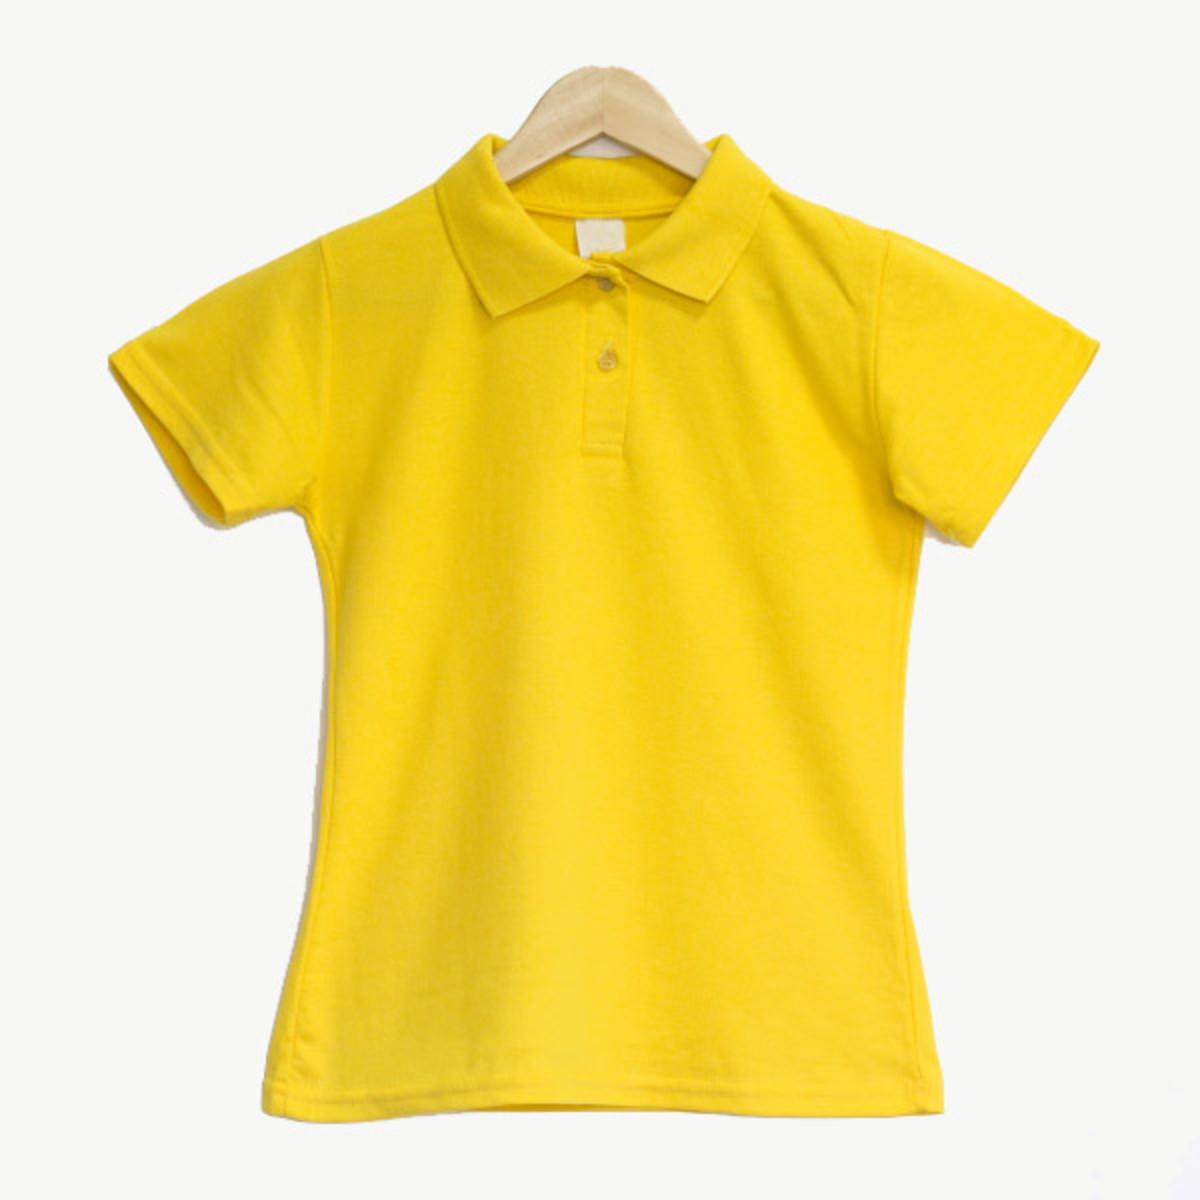 865dc8876c Camiseta Gola Polo Feminino Amarelo no Elo7